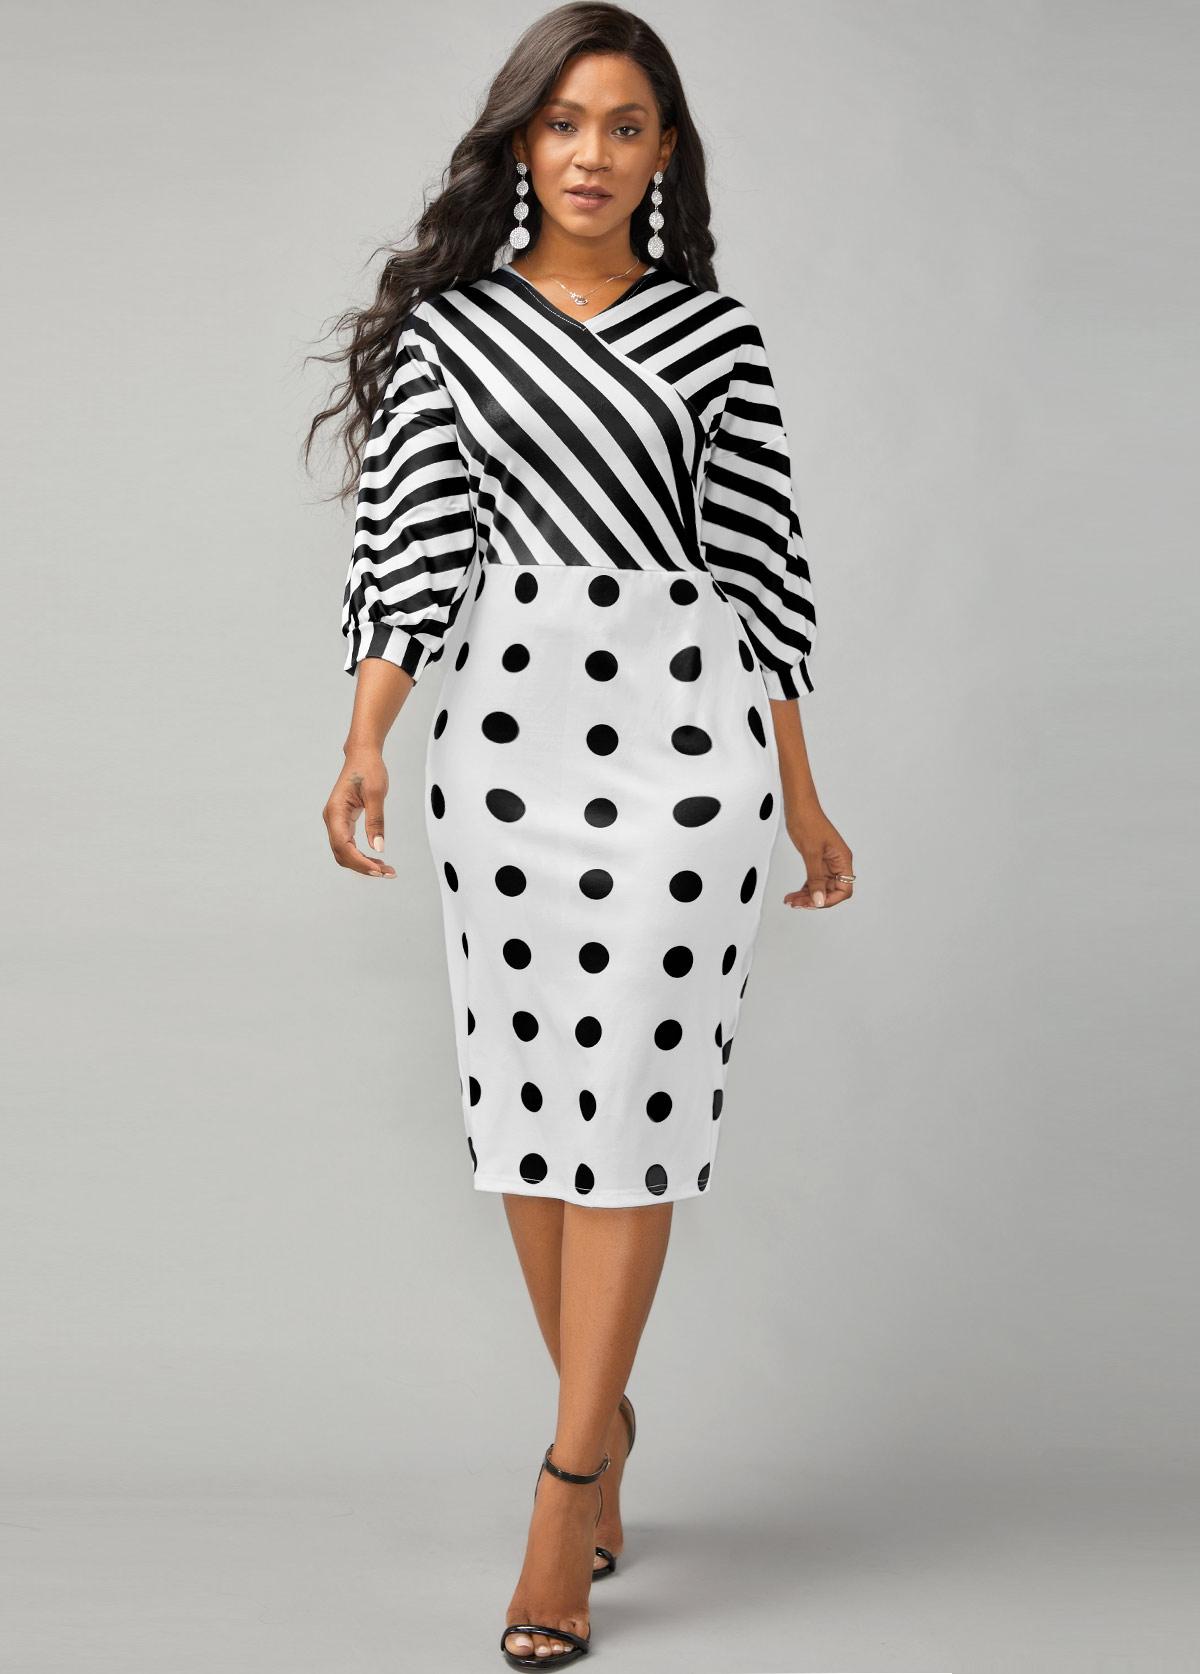 Lantern Sleeve Stripe and Polka Dot Print Dress